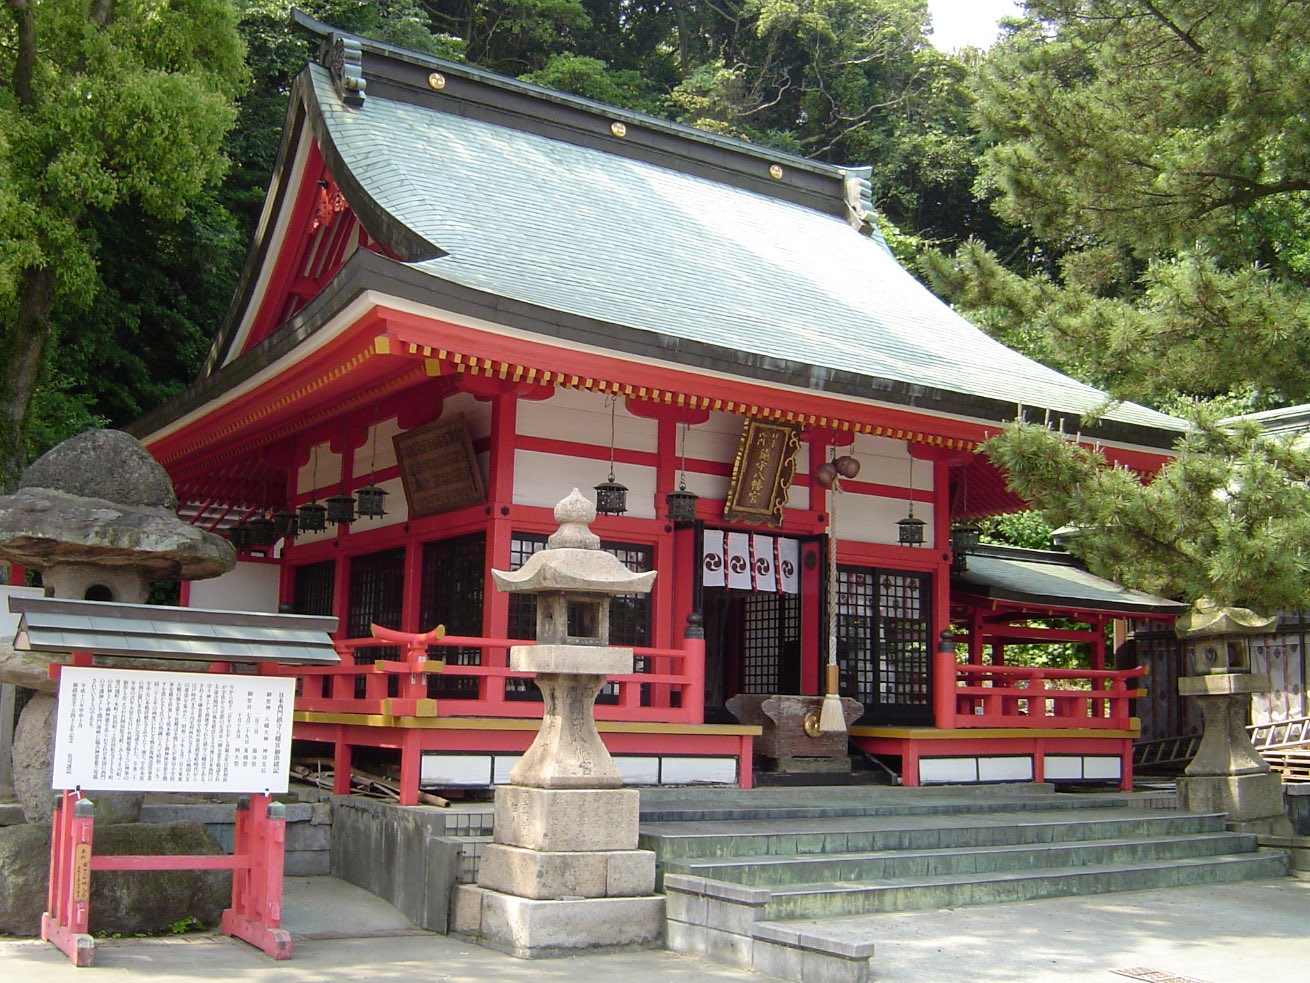 Shimonoseki Japan  city photos gallery : Shimonoseki City | Next Stop, Japan